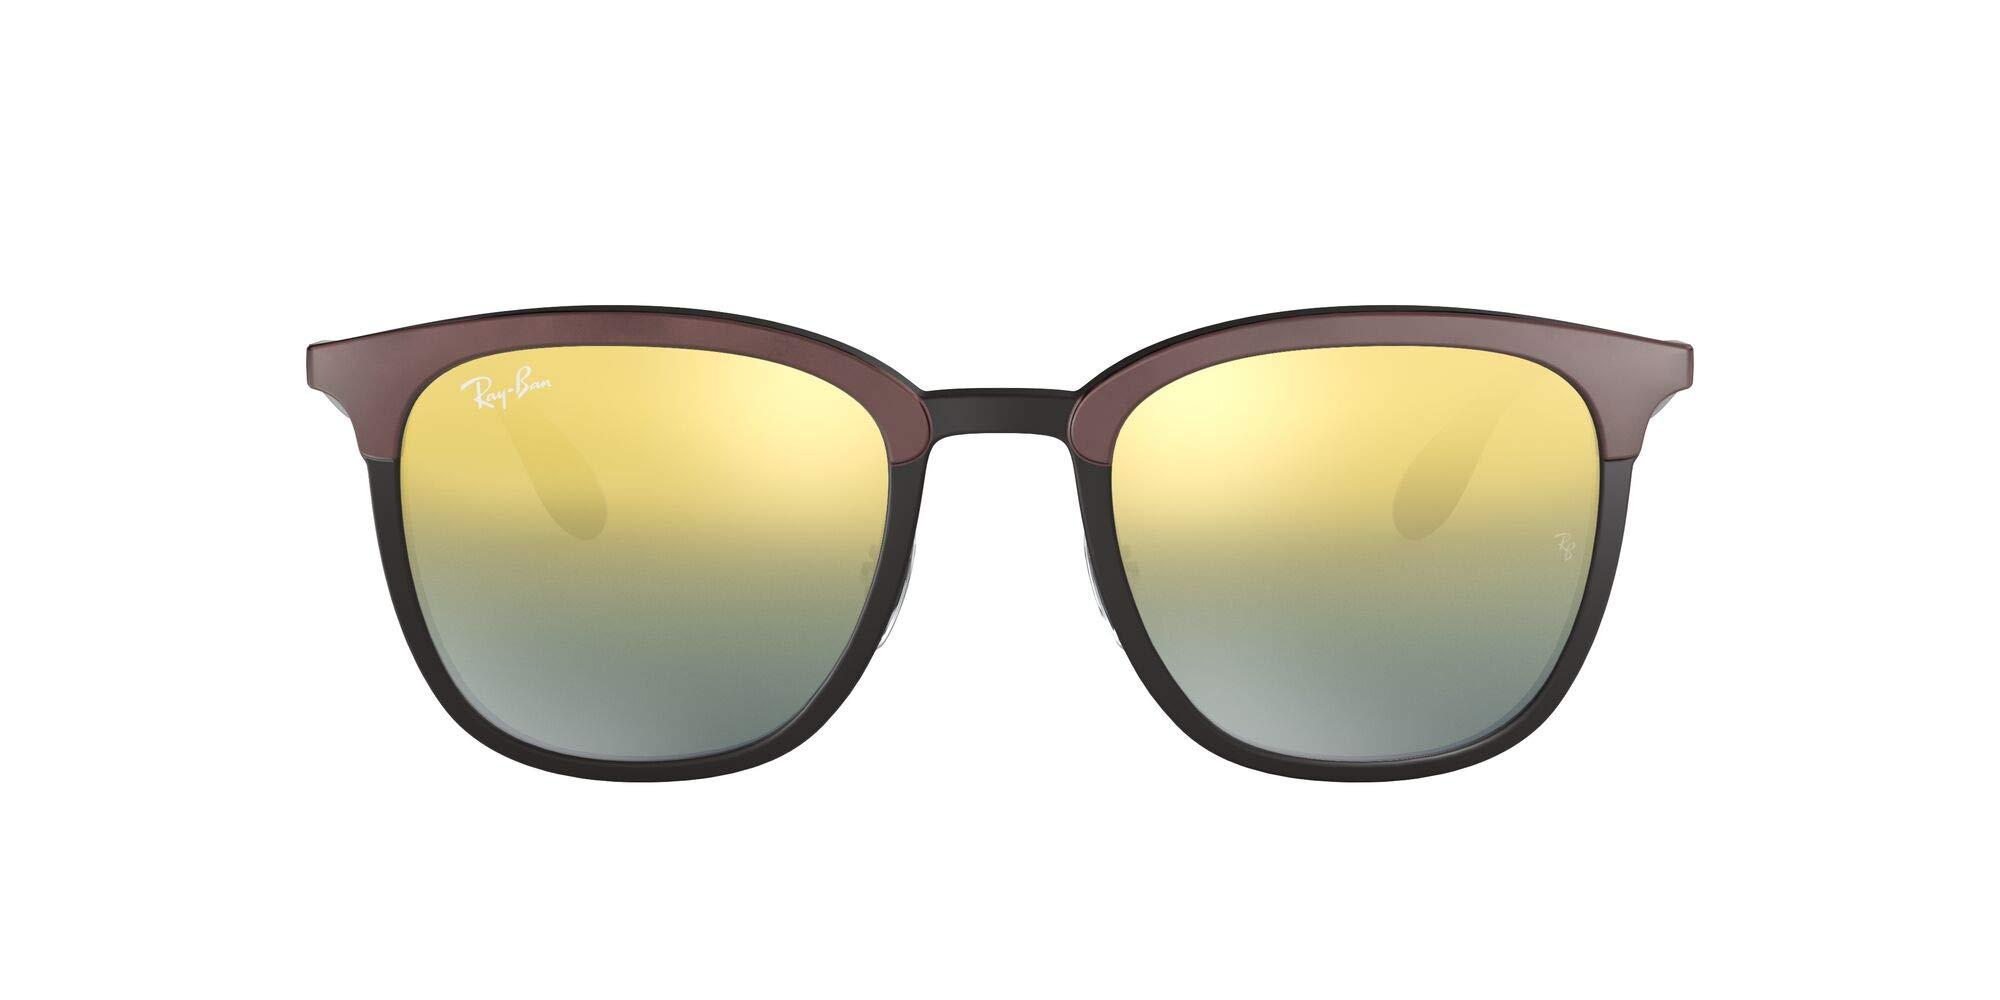 Ray-Ban unisex-adult Rb4279 Round Sunglasses Round Sunglasses